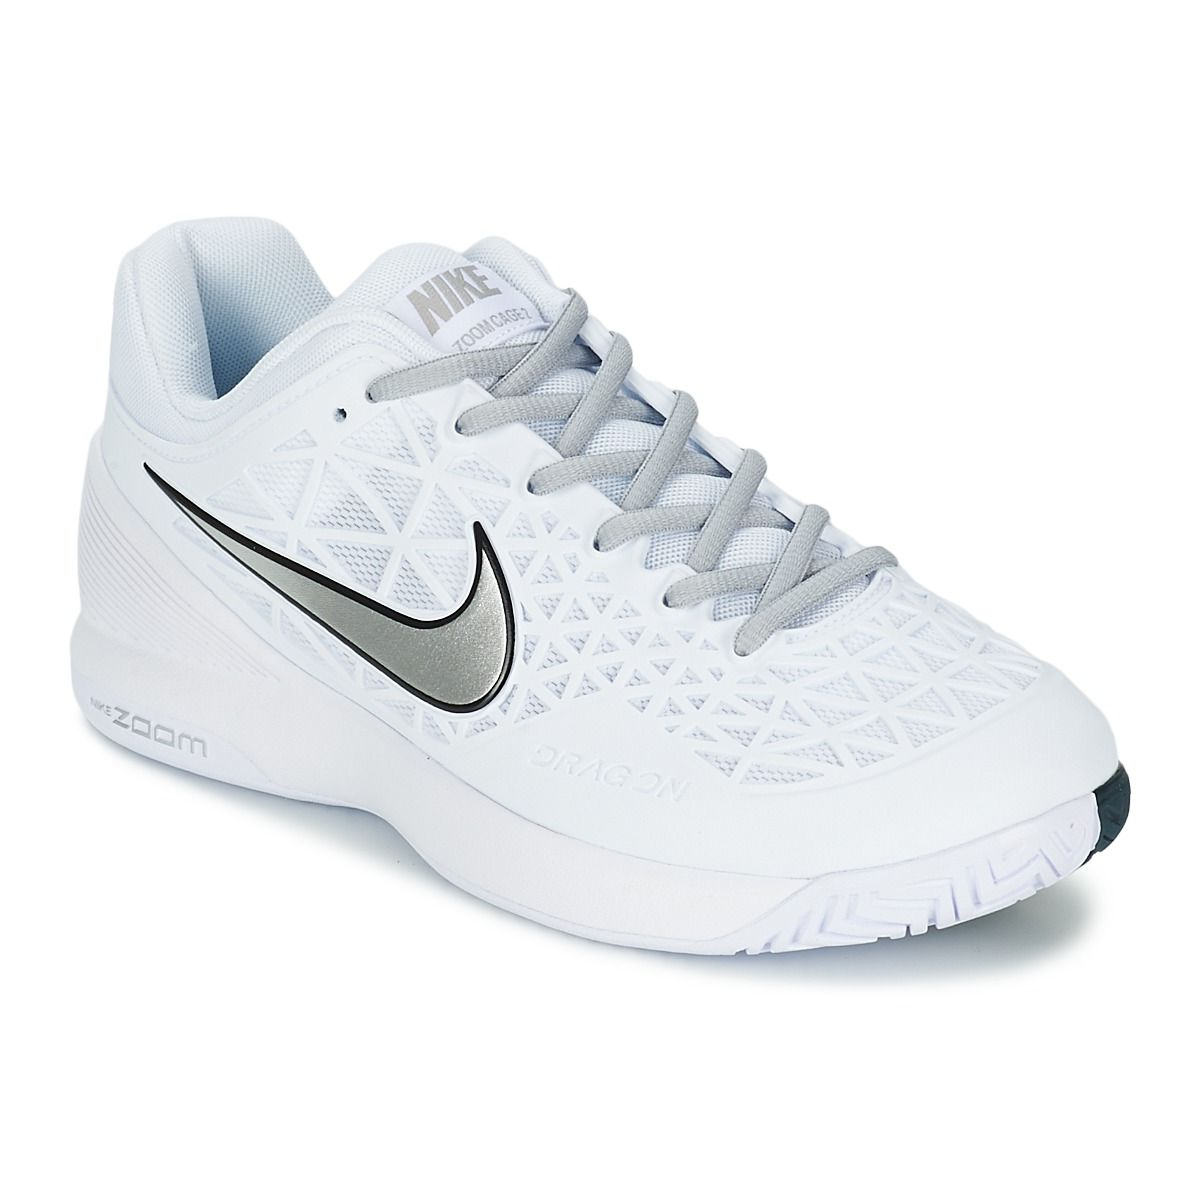 chaussure de tennis nike femme pas cher